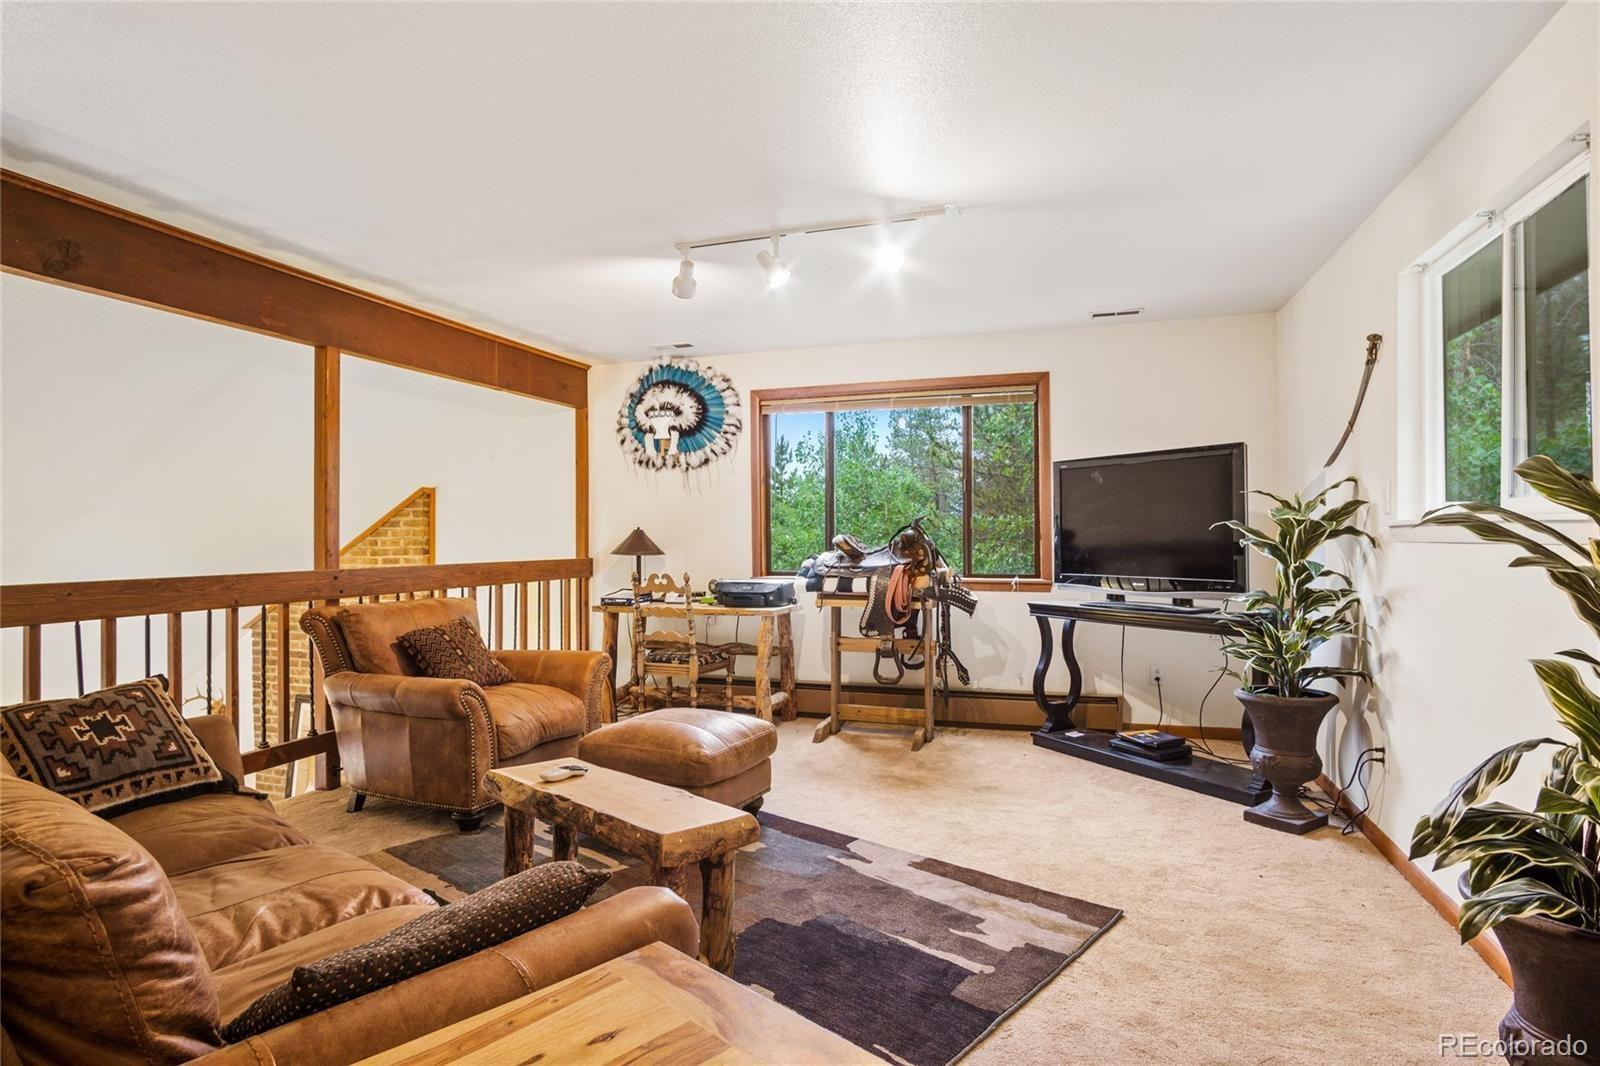 MLS# 5887293 - 4 - 8858 Black Mountain Drive, Conifer, CO 80433